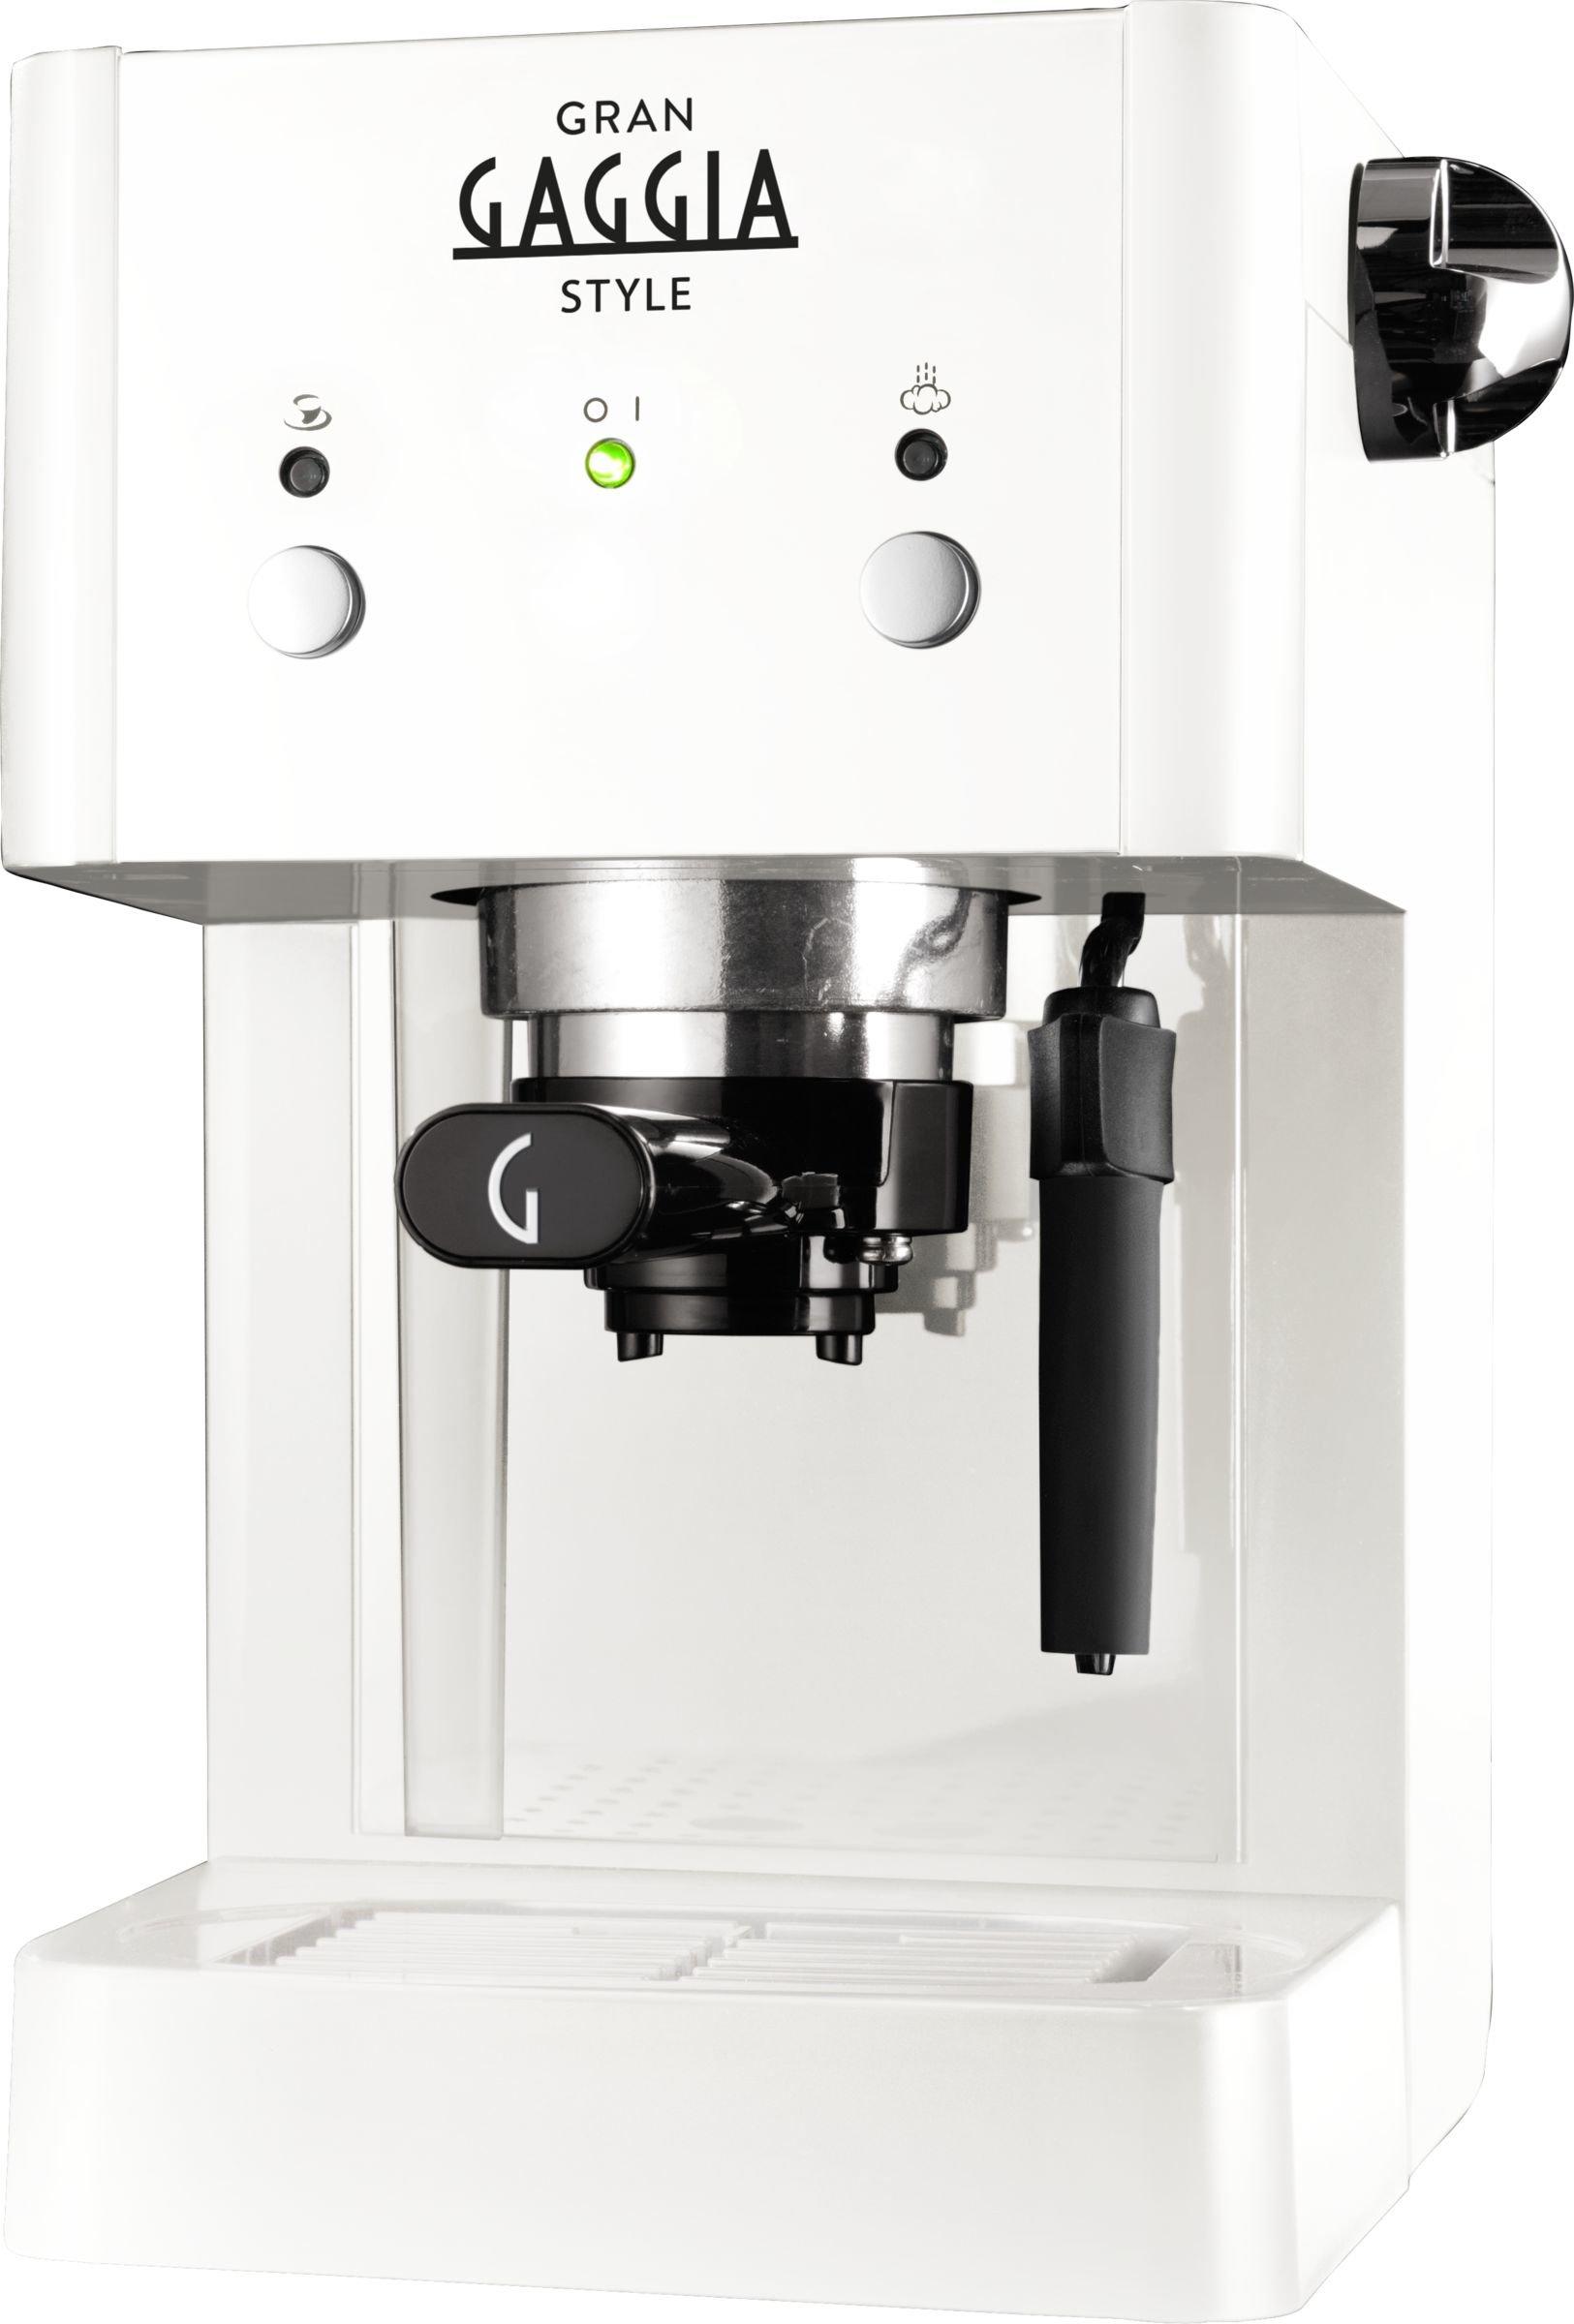 Gaggia-Macchina-da-caff-manuale-RI842321-Gran-Style-Kaffeemaschine-wei